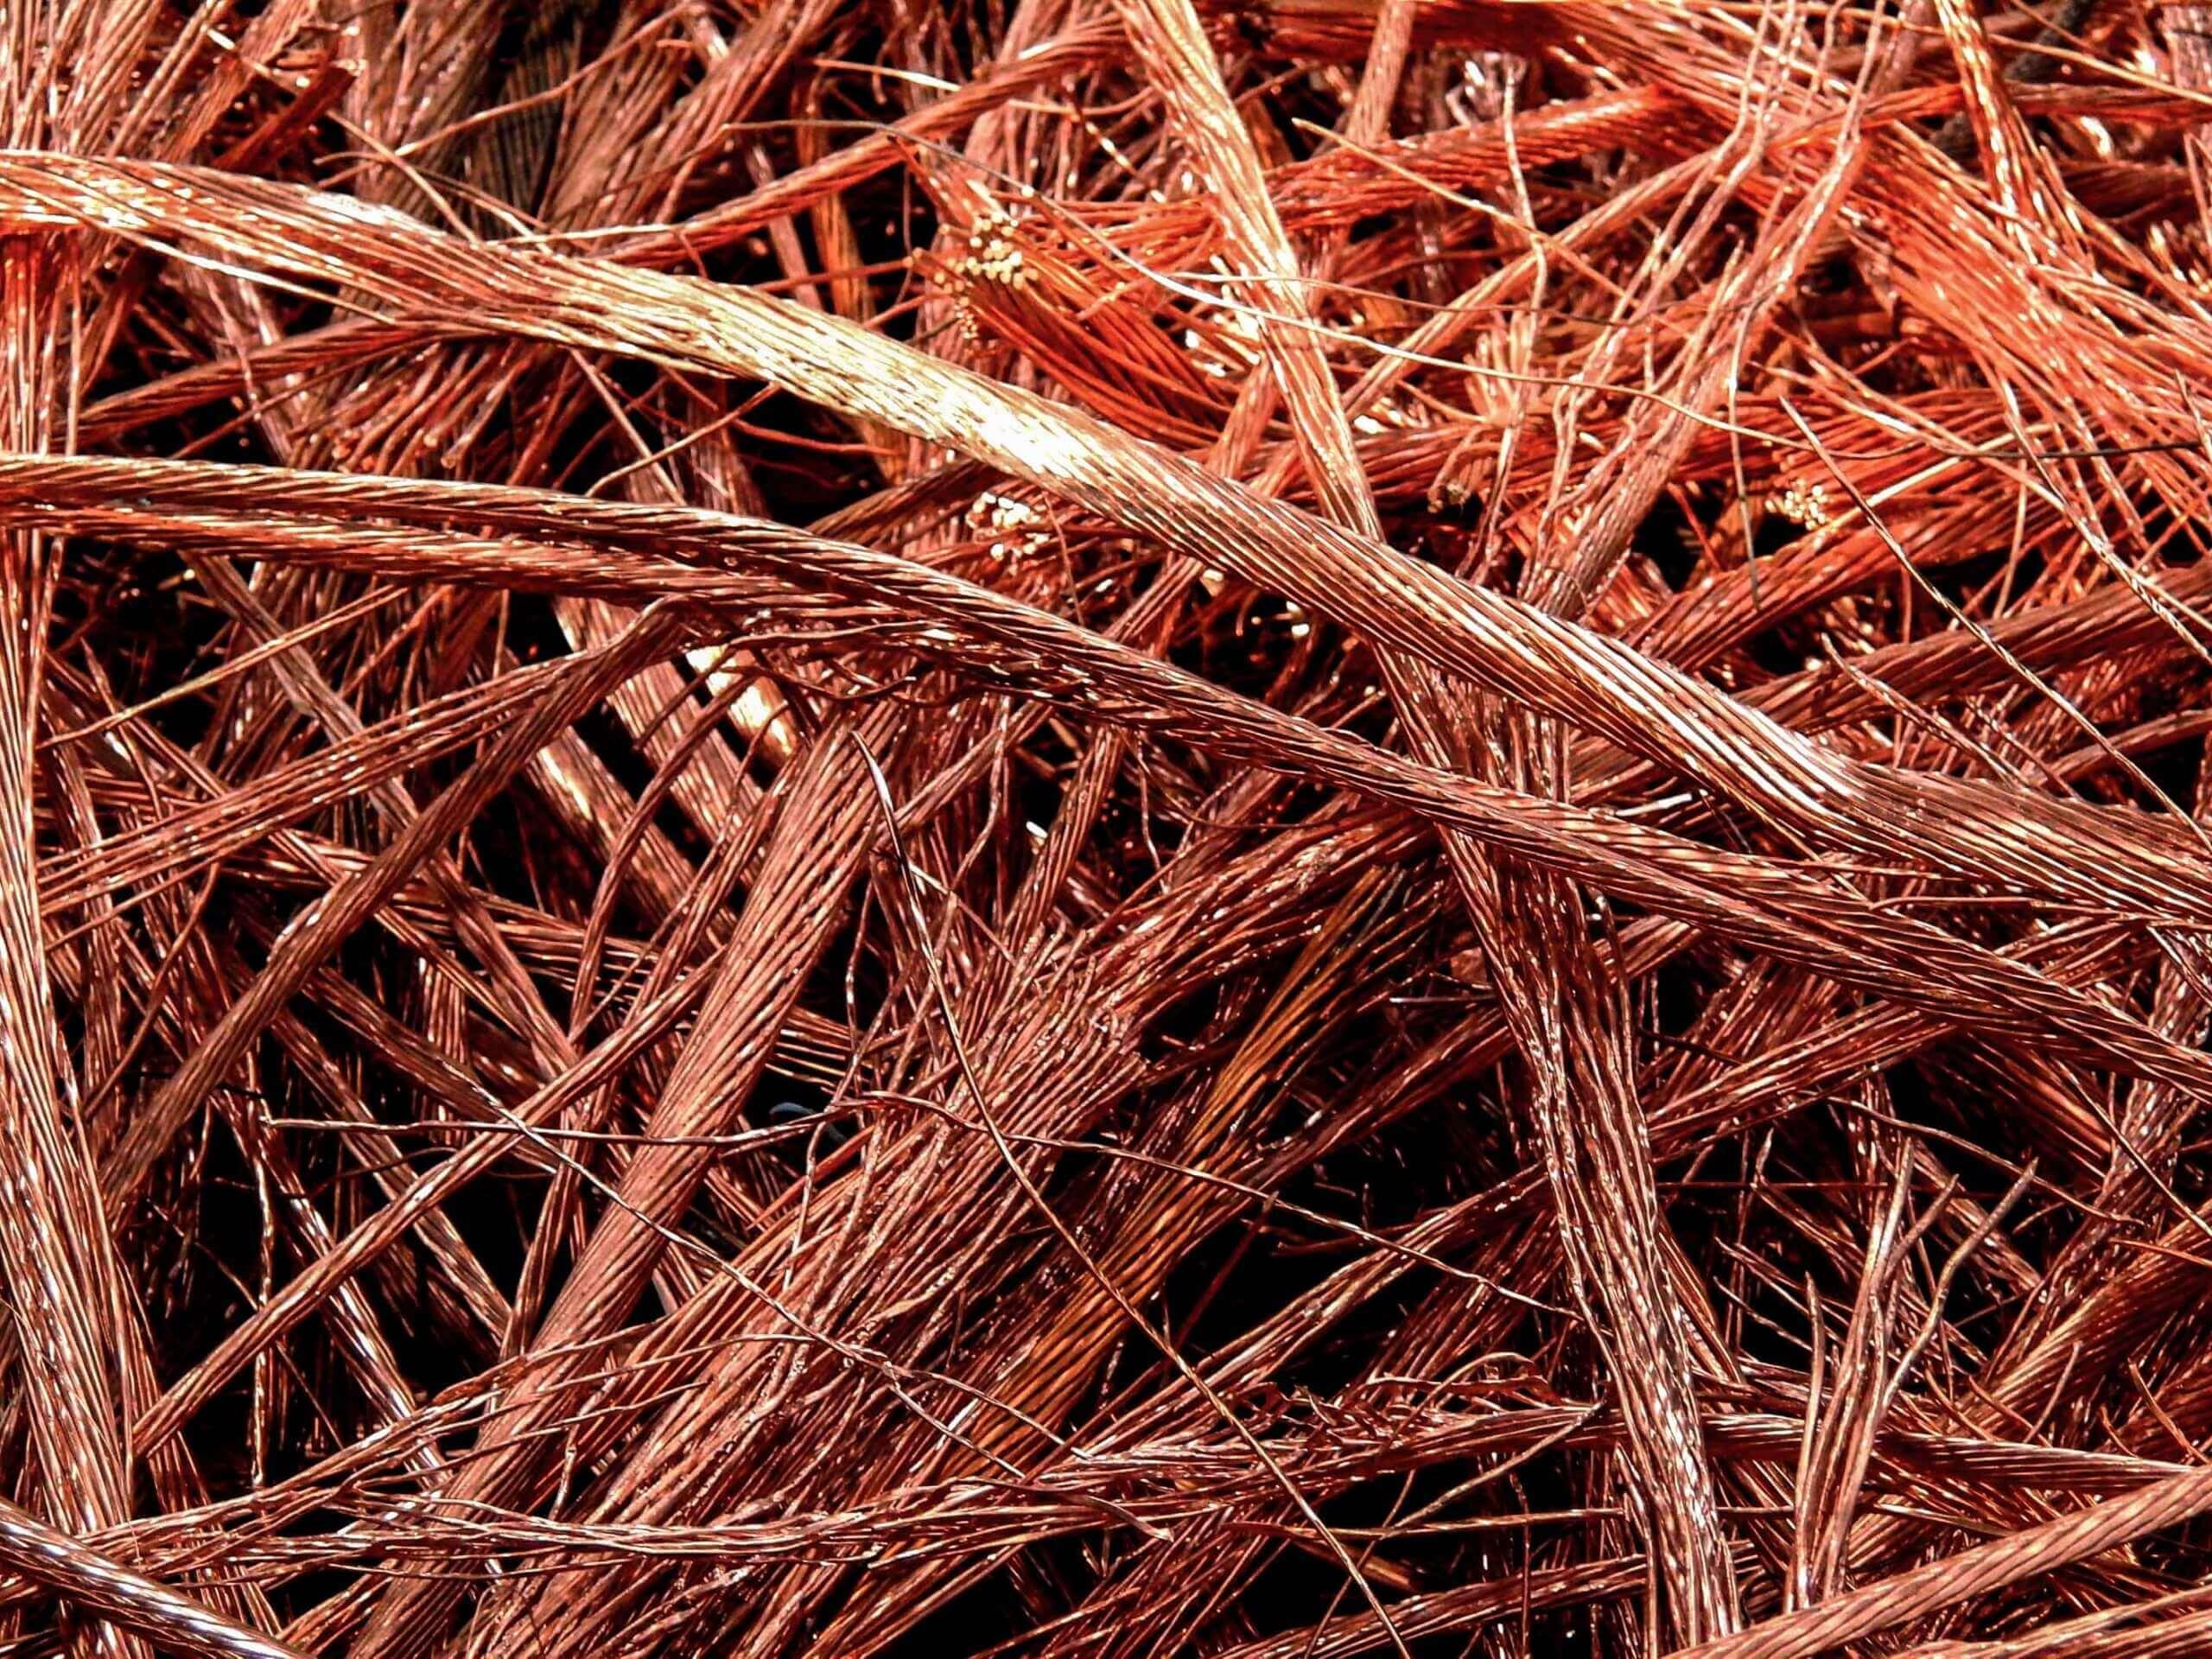 Copper wire and copper shavings